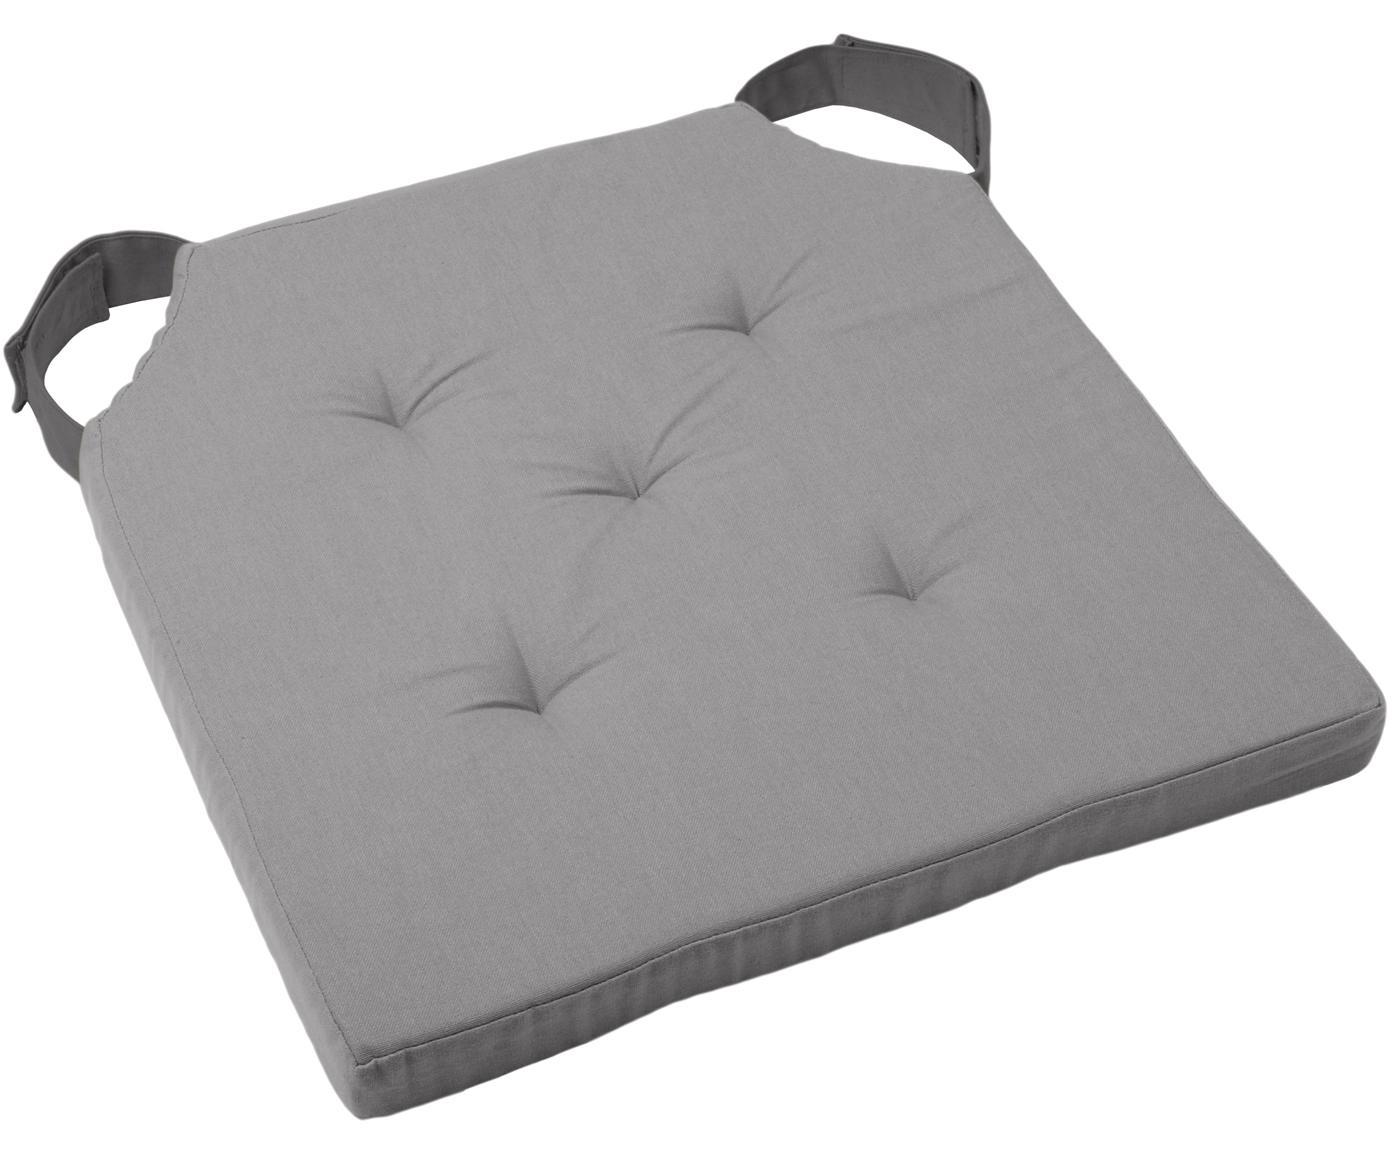 Cuscino sedia Duo, Rivestimento: cotone, Grigio, Larg. 40 x Lung. 40 cm